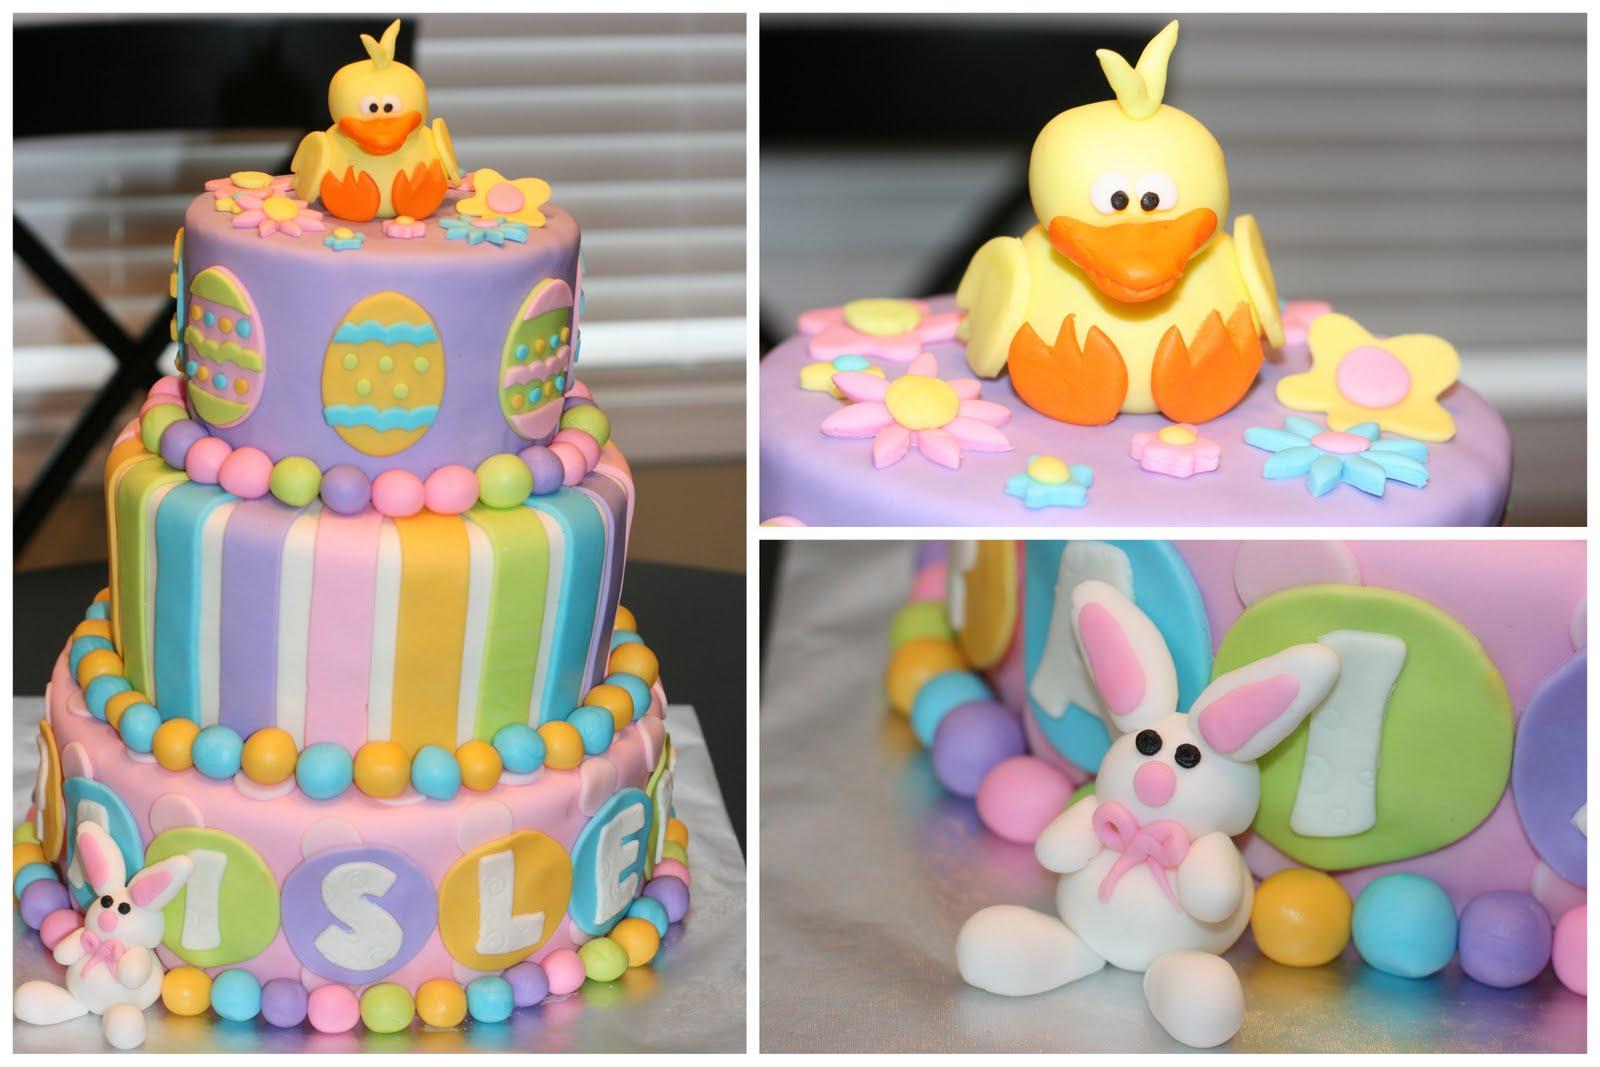 Astounding 8 Easter Birthday Cupcakes Photo Easter Themed Birthday Cake Personalised Birthday Cards Paralily Jamesorg